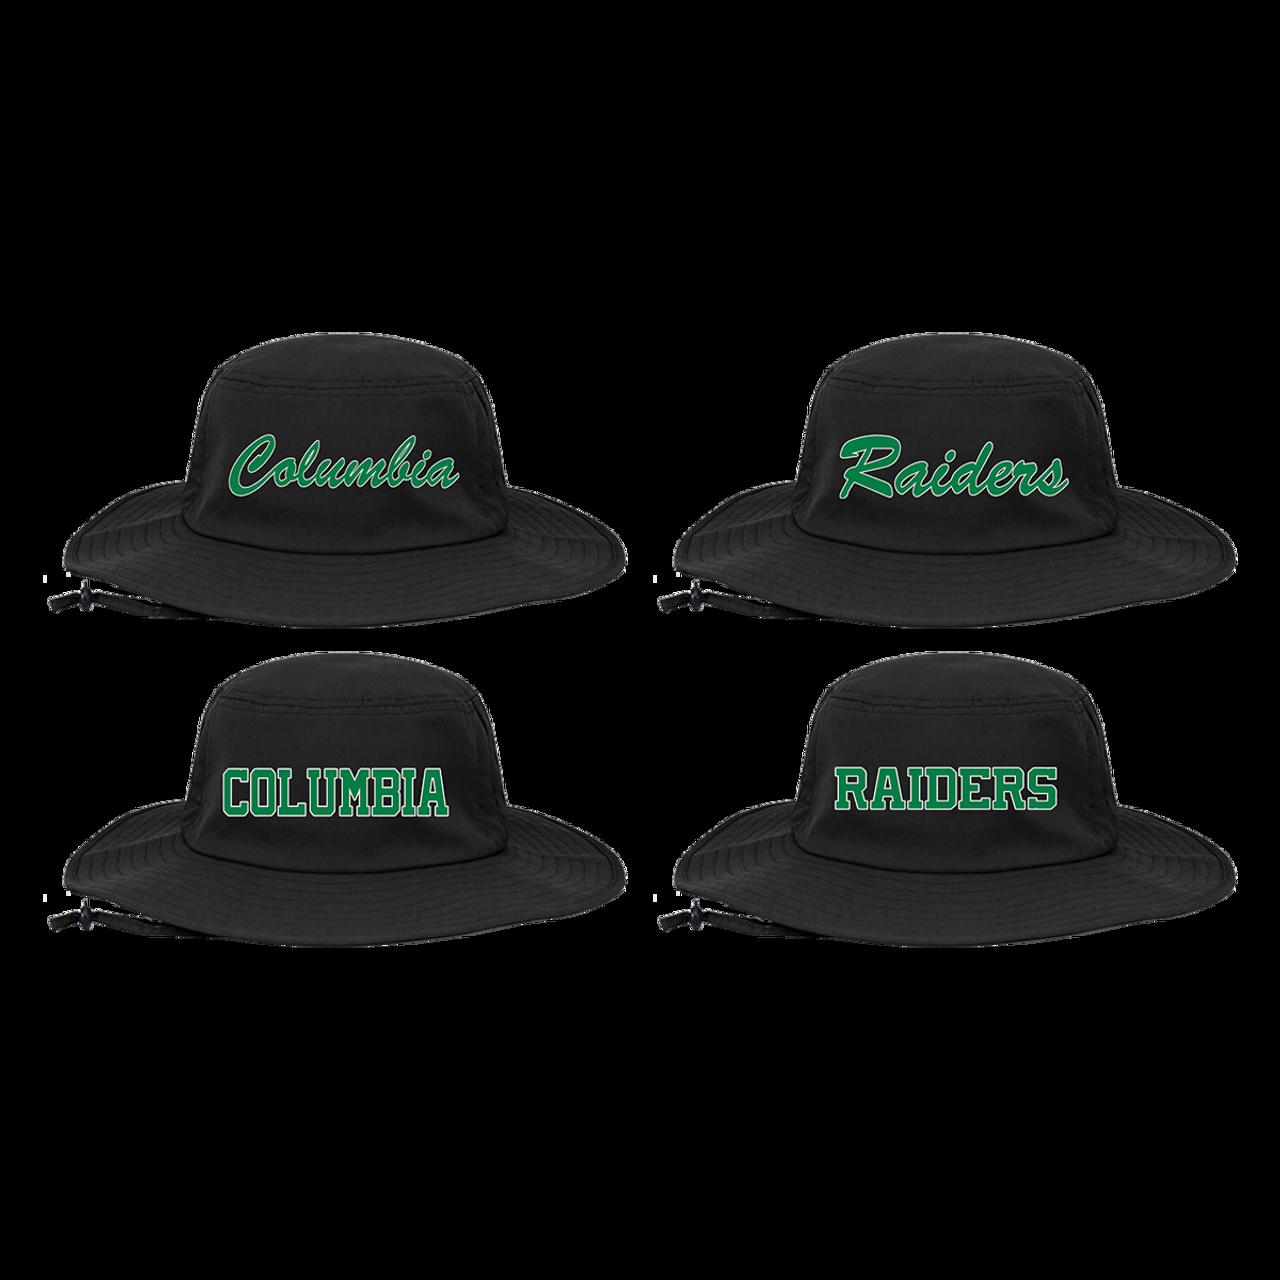 a8b61bf1efaea Columbia Raiders Boonie Hat (RY201 RY203 RY205 RY207) - RycoSports